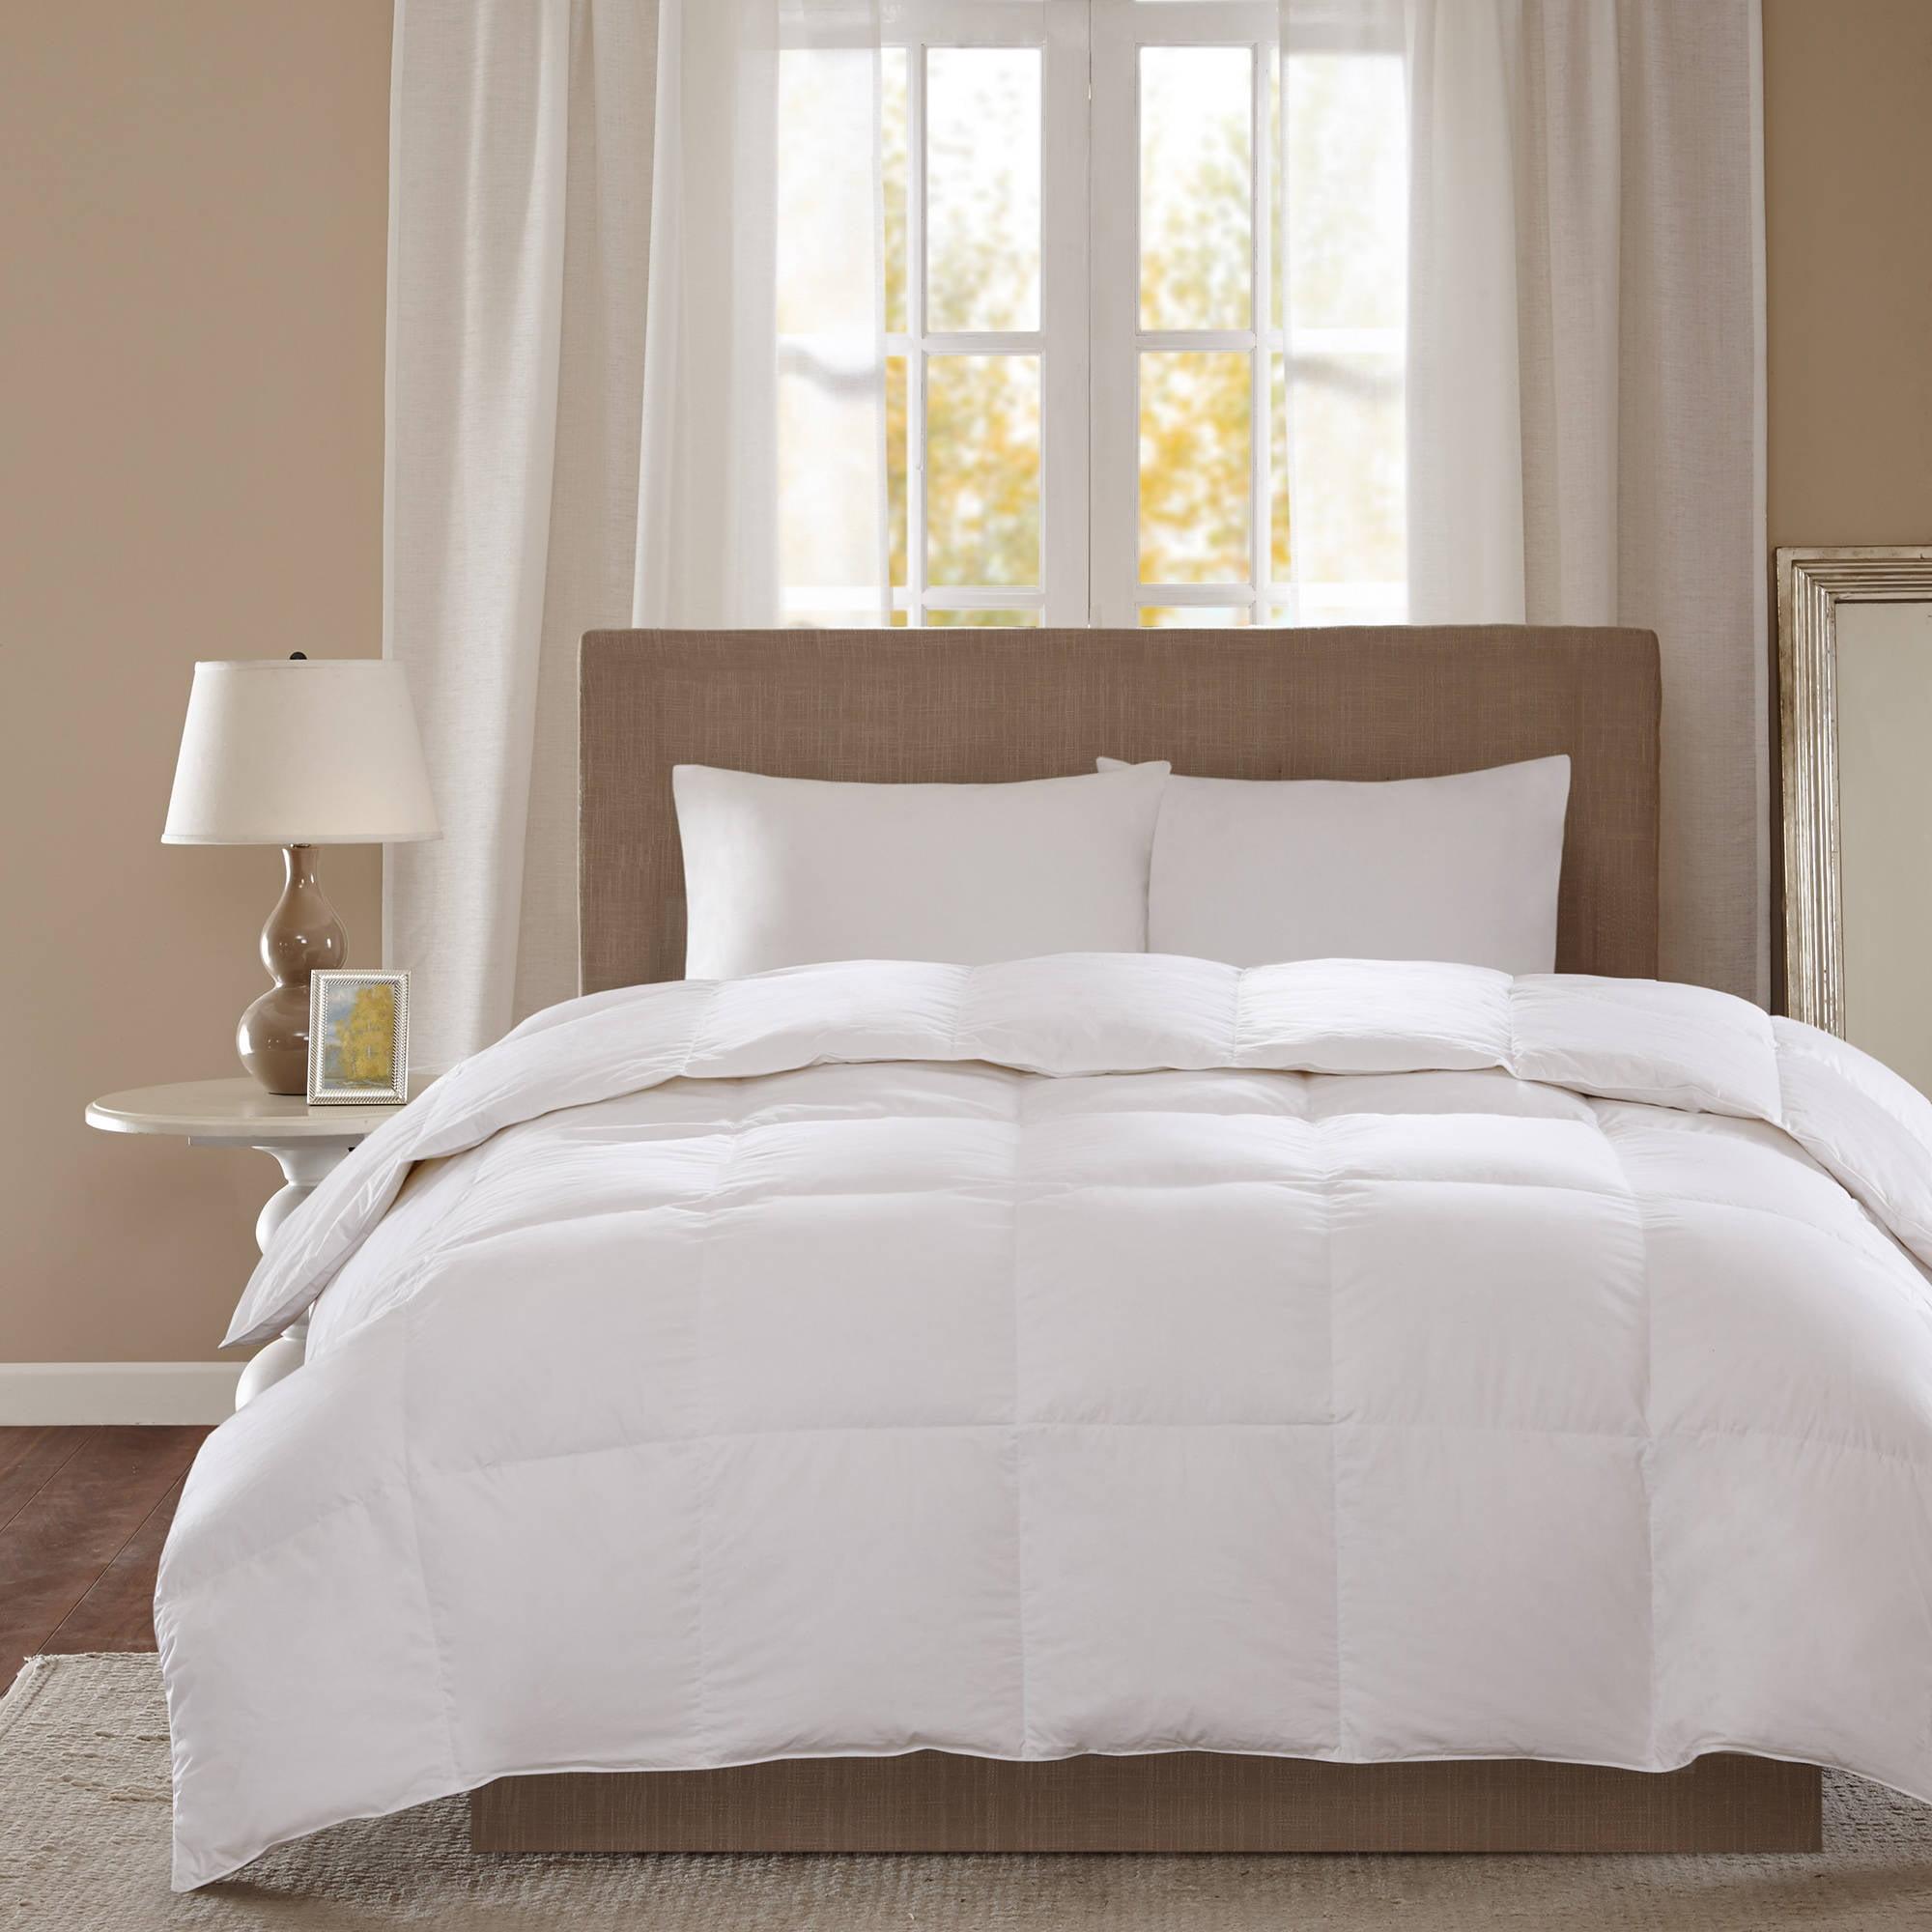 Comfort Classics 300 Thread Count 3M Scotchgard White Down Comforter, Level 2